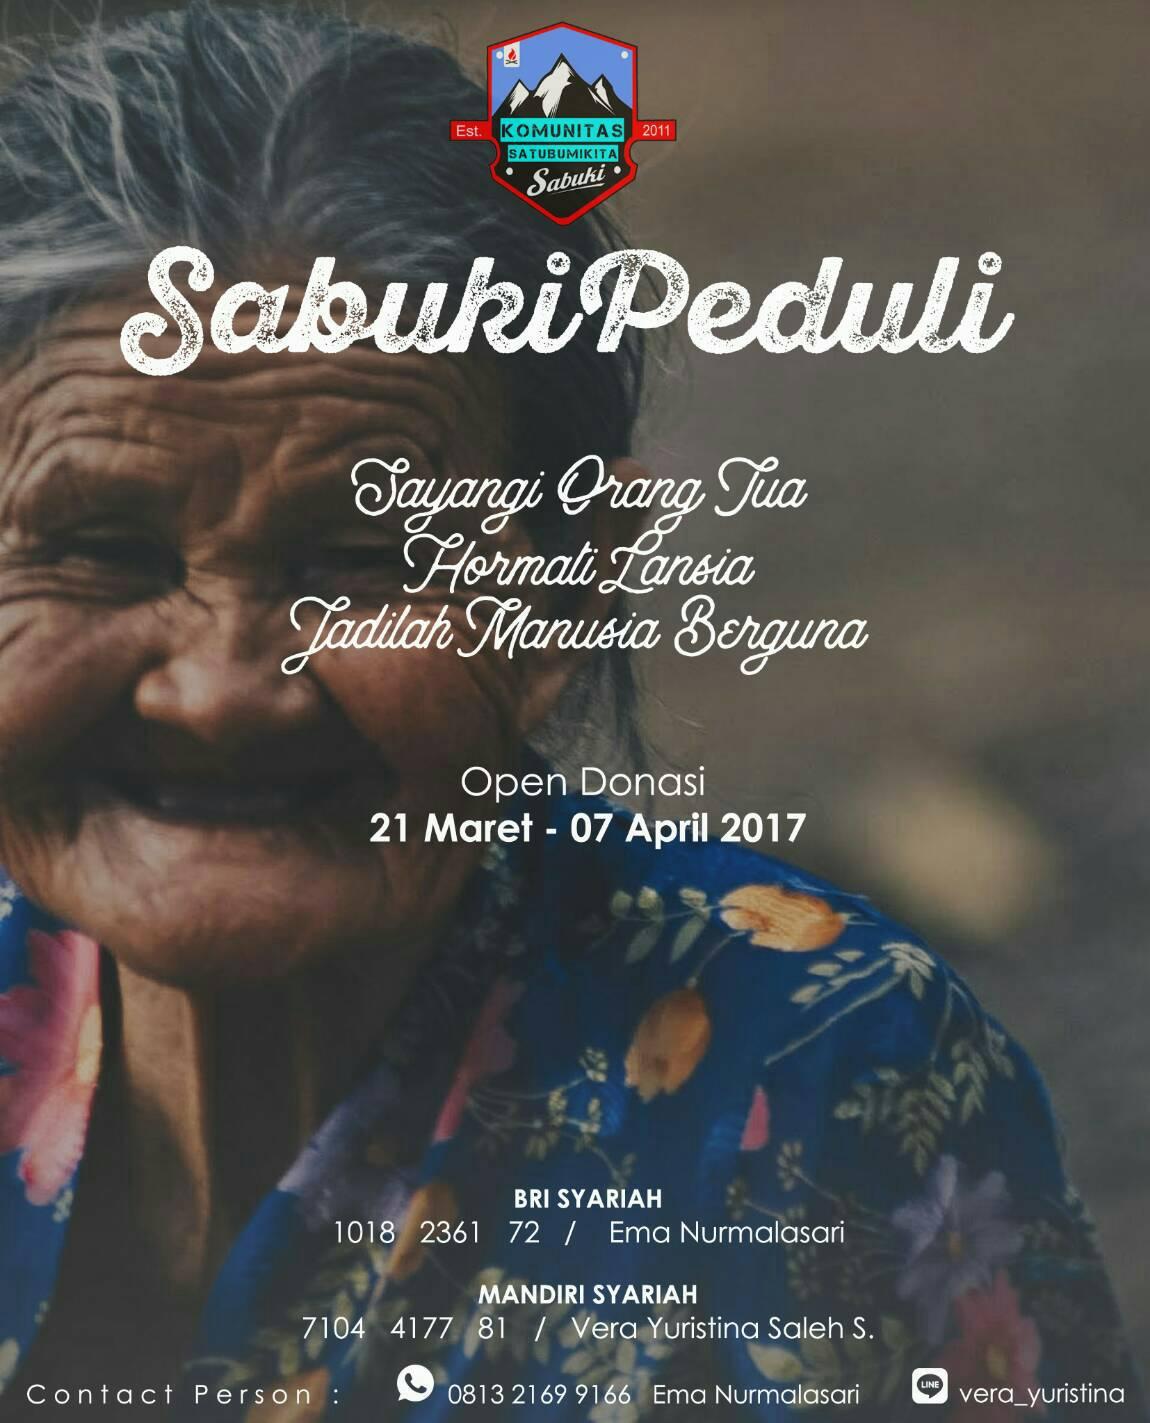 Sabuki Peduli Lansia, Open Donasi, 21 Maret-07 April 2017